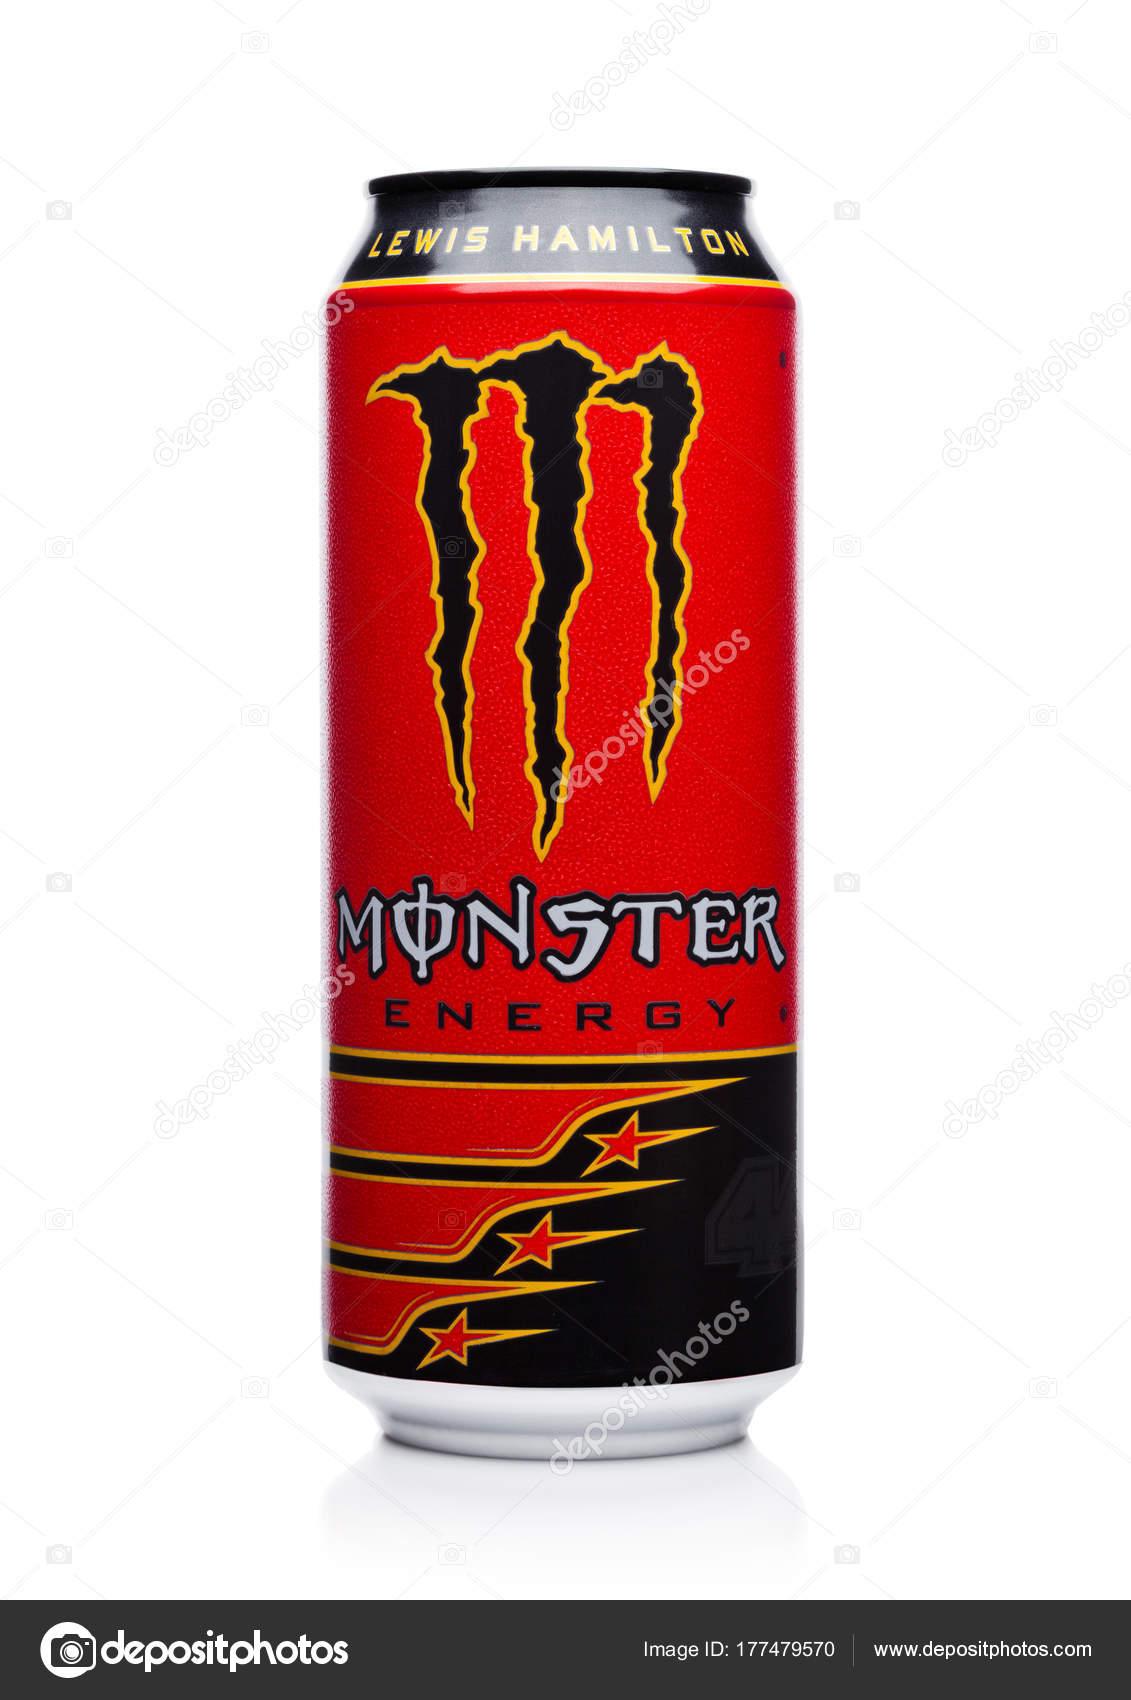 London, Uk - 15. Dezember 2017: Eine Dose der Monster Energy Drink ...